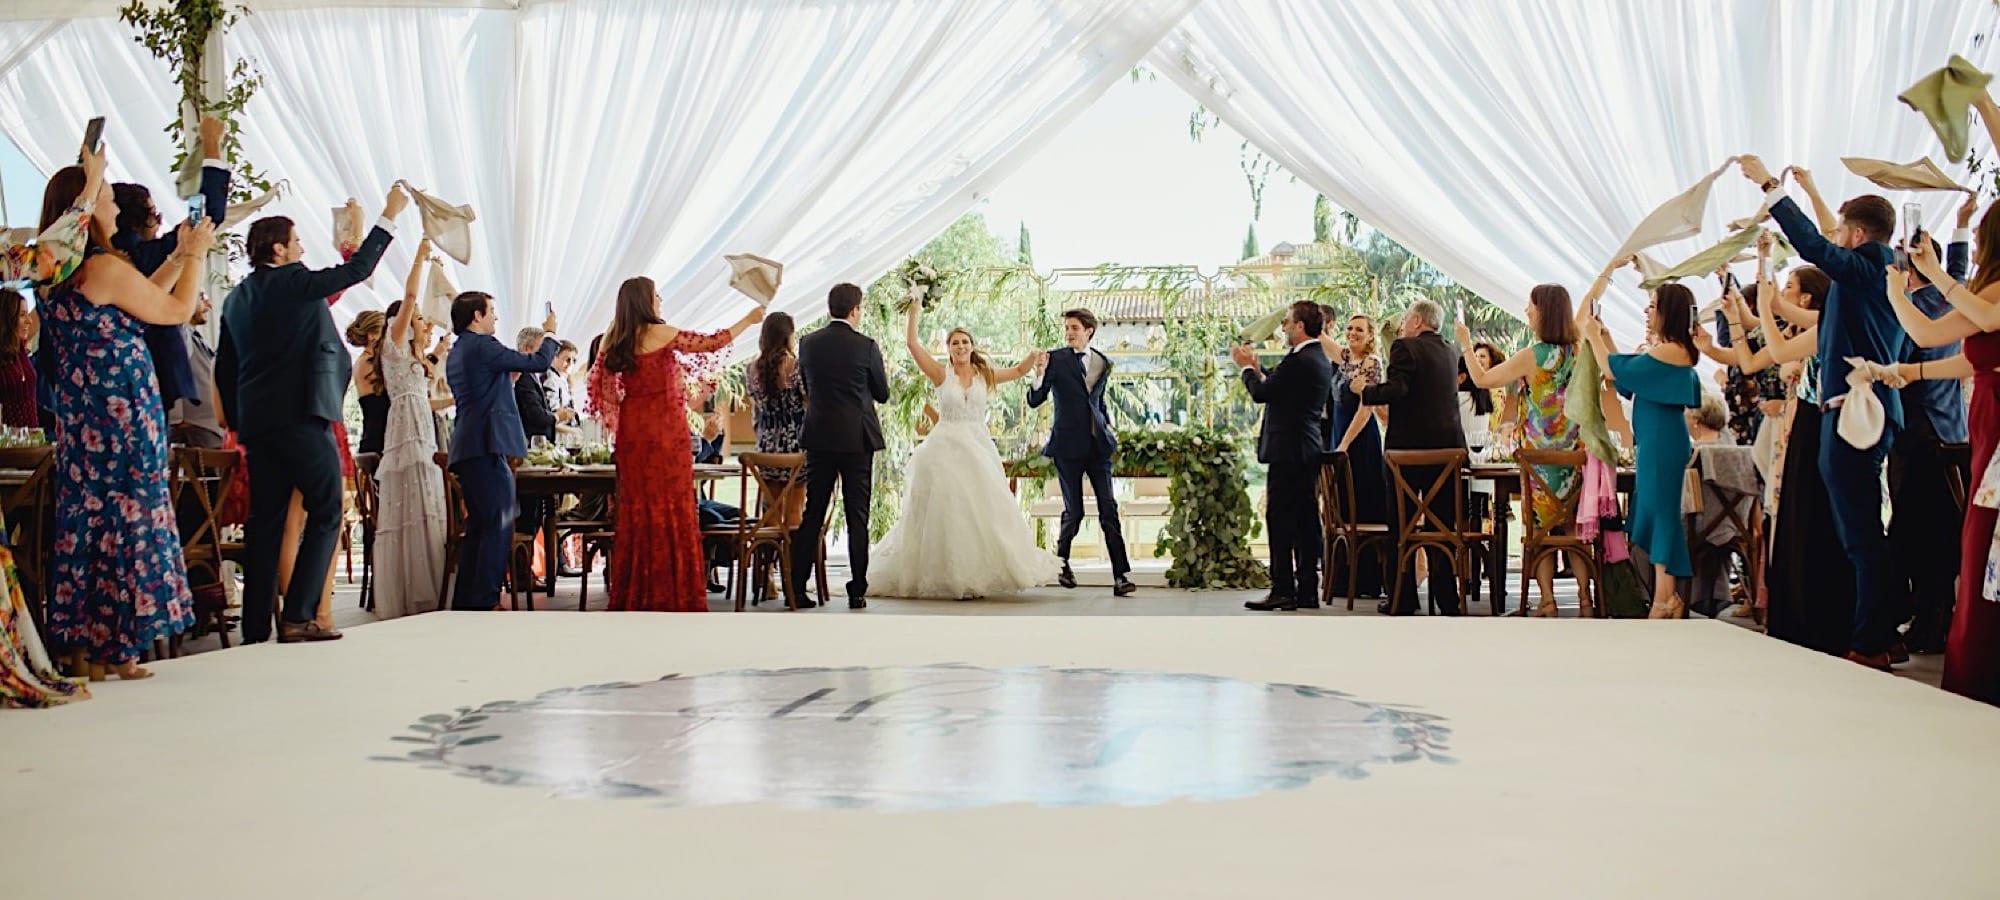 penzi bodas san miguel